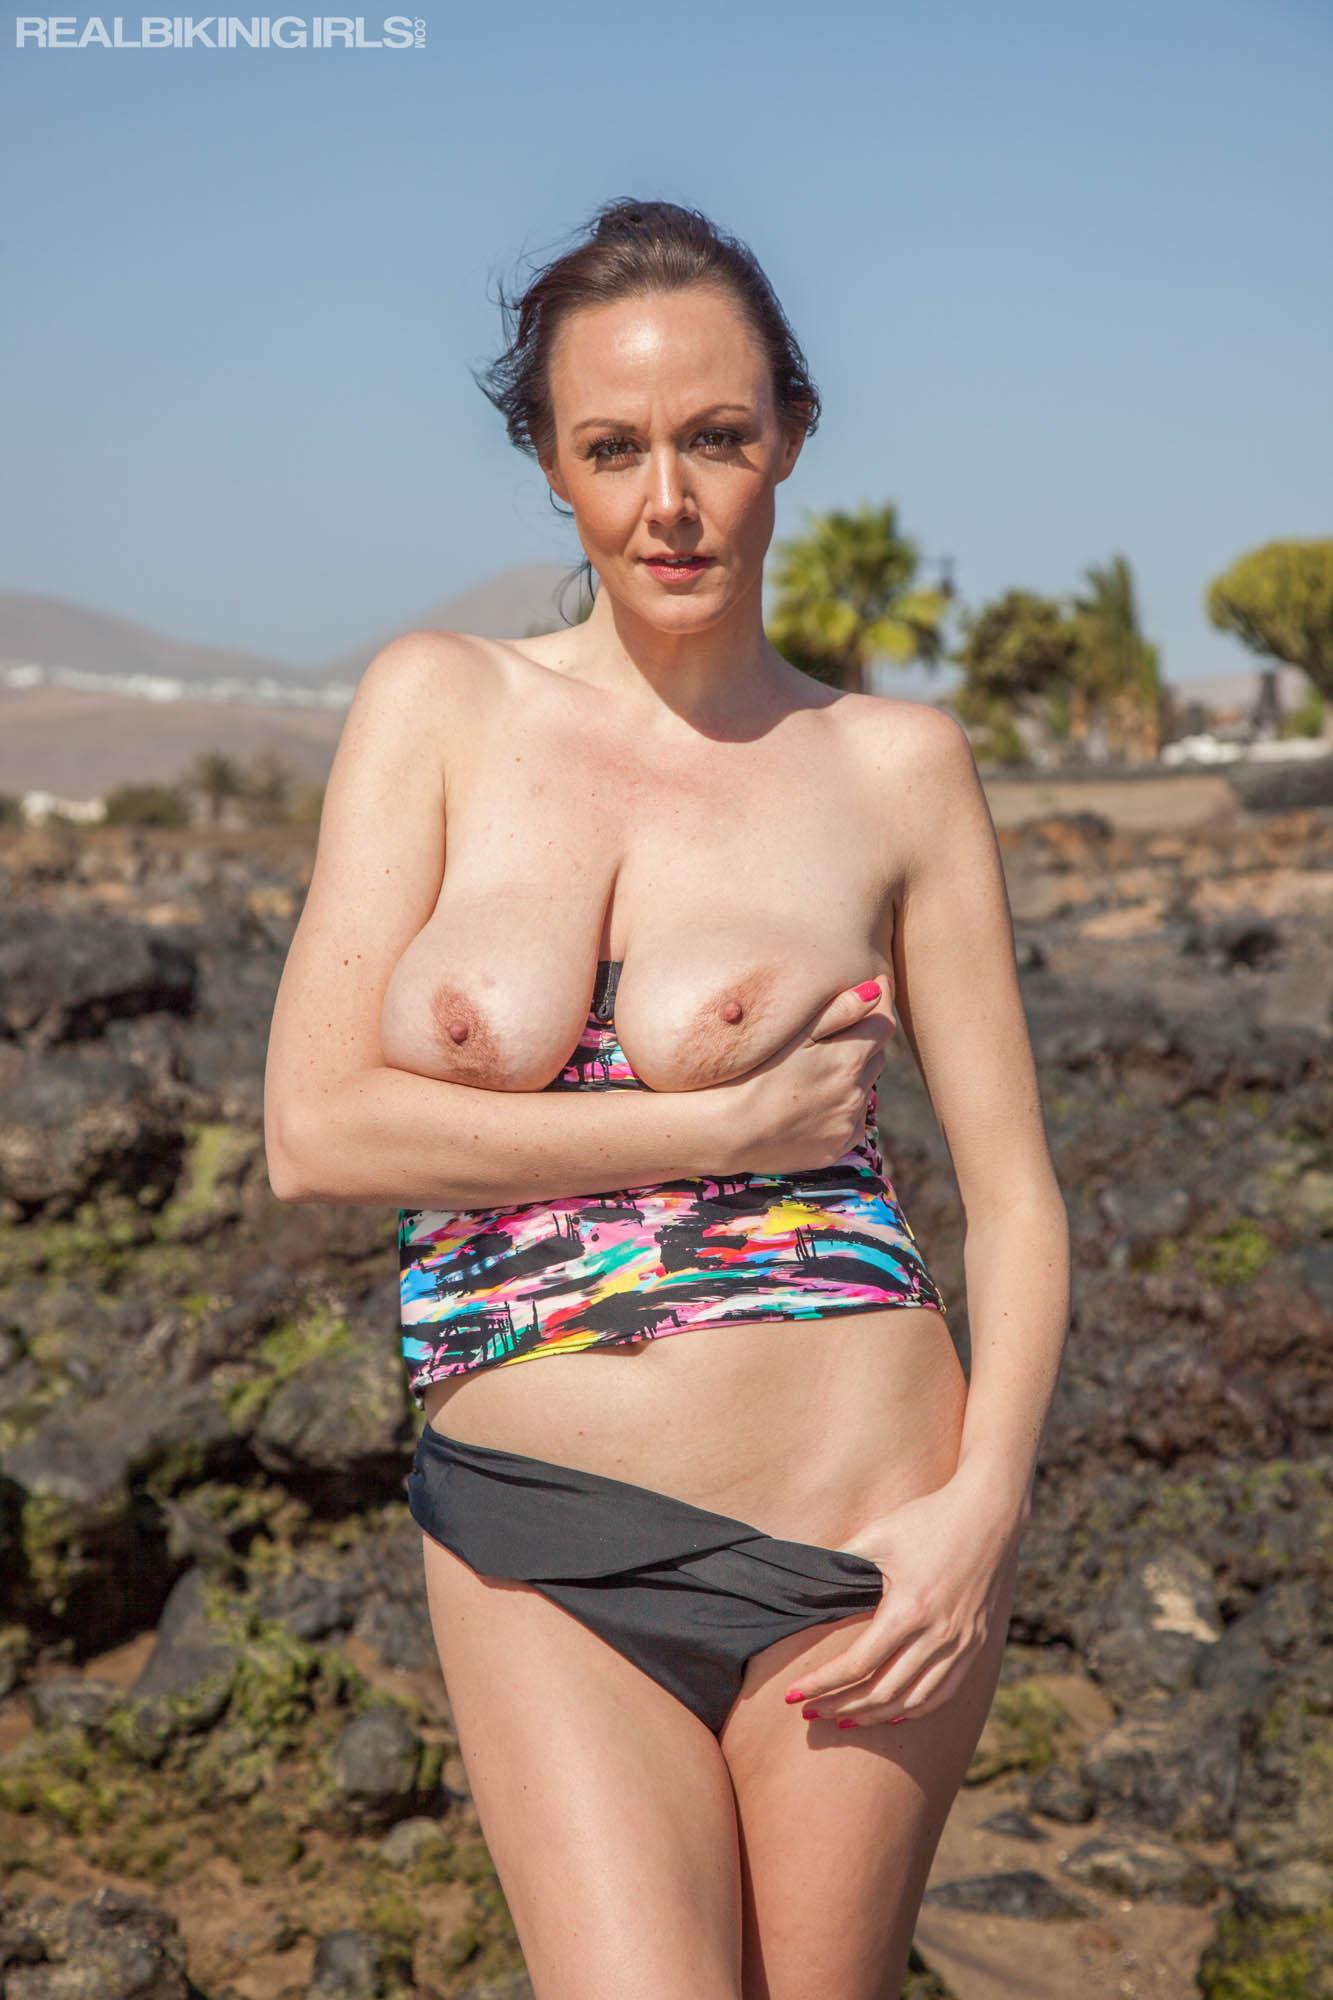 Rock Pool - Free bikini photos from RealBikiniGirls.com